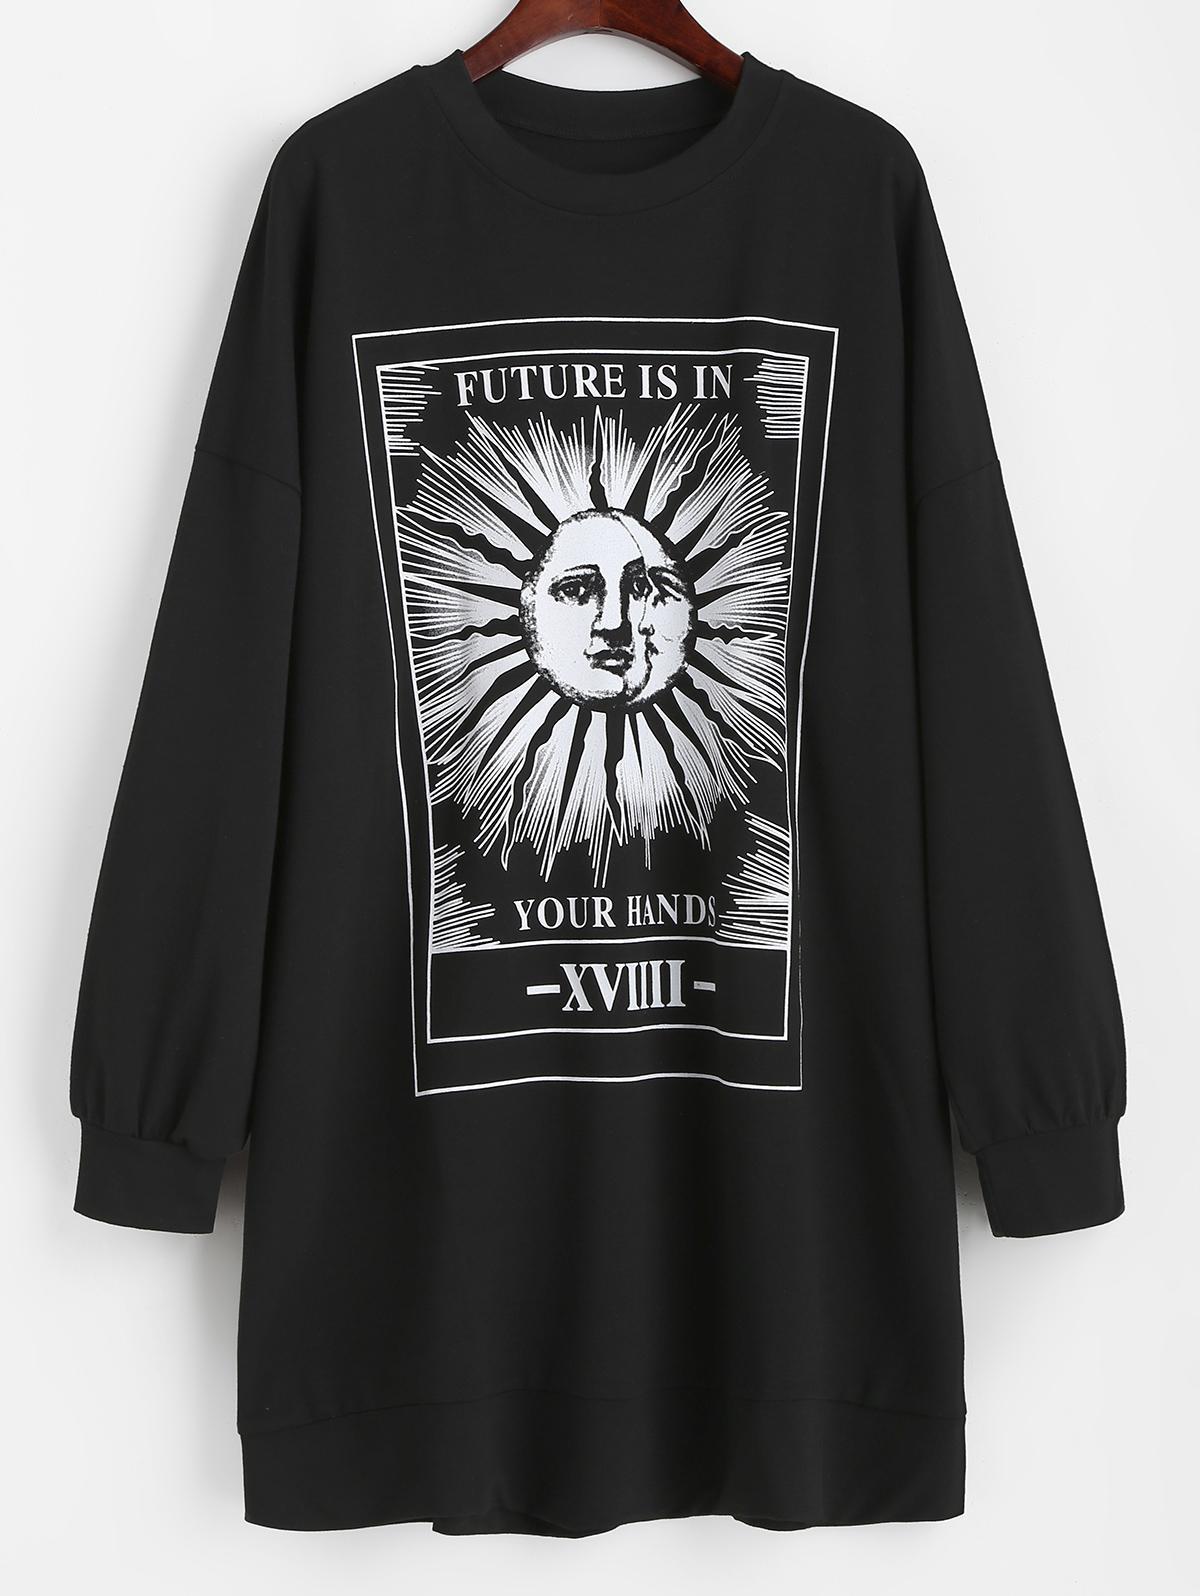 Casual Sun Graphic Tie Dye Sweatshirt Dress